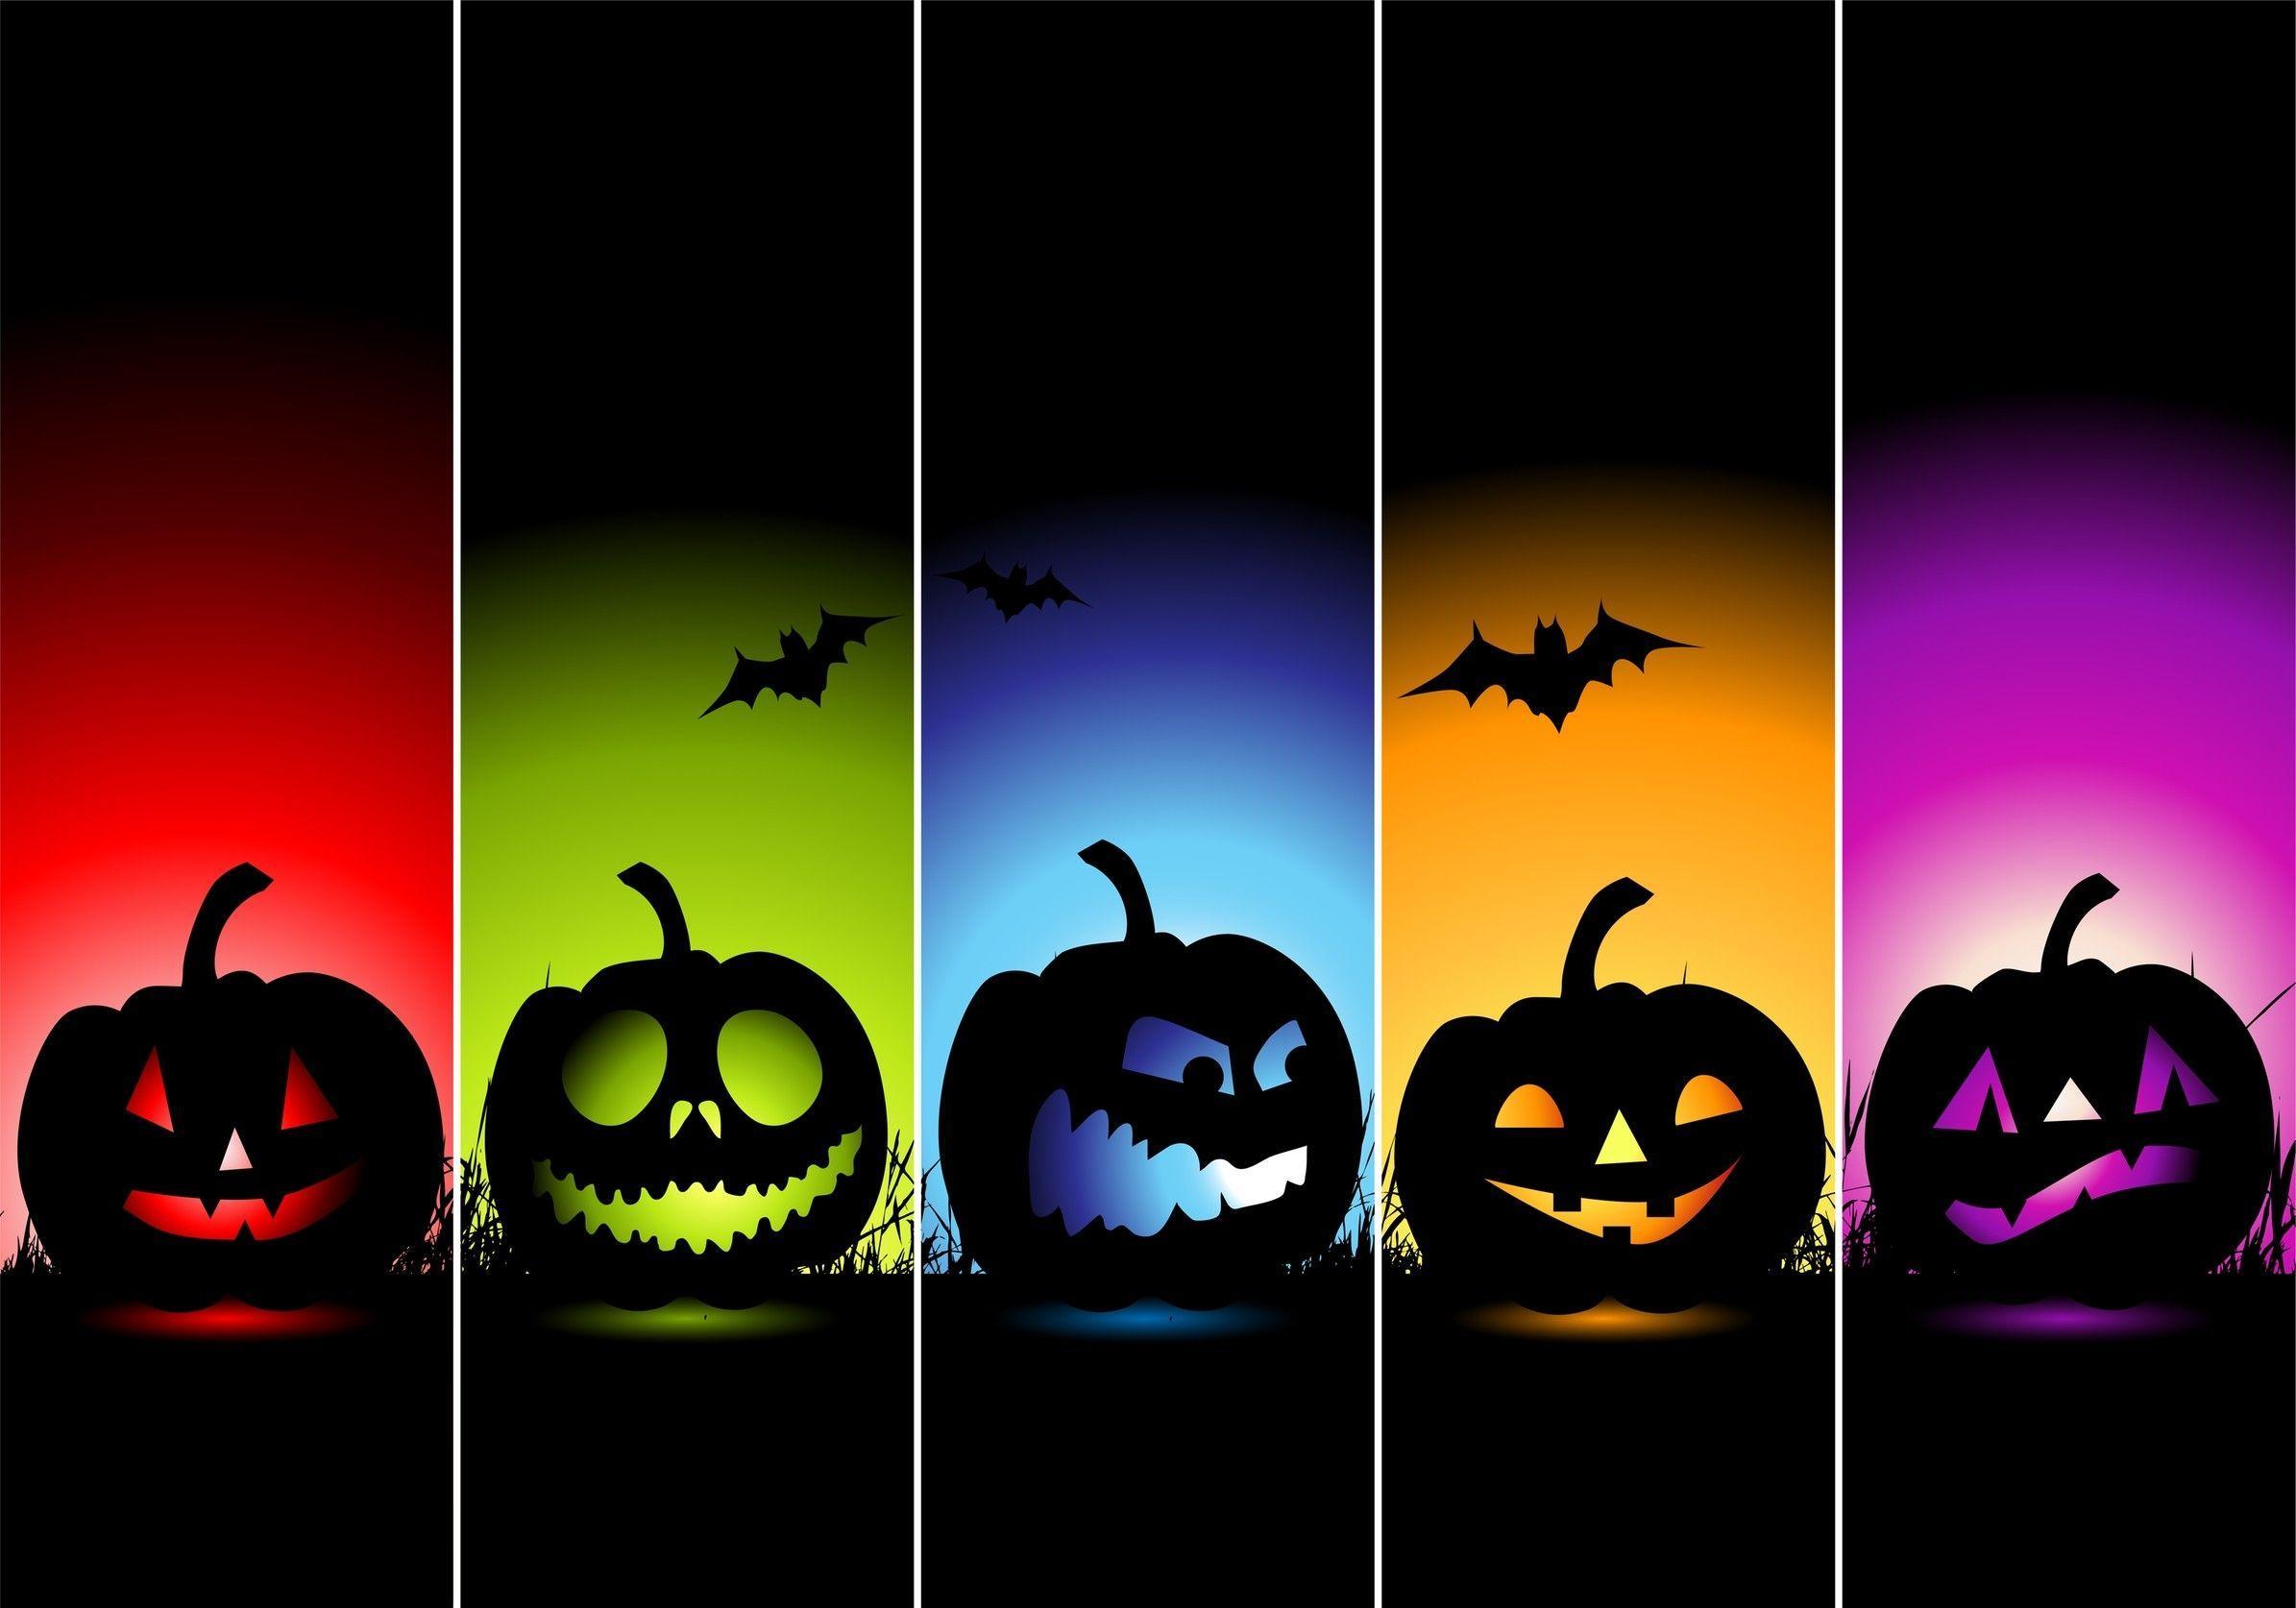 Cute Halloween Desktop Wallpapers Top Free Cute Halloween Desktop Backgrounds Wallpaperaccess